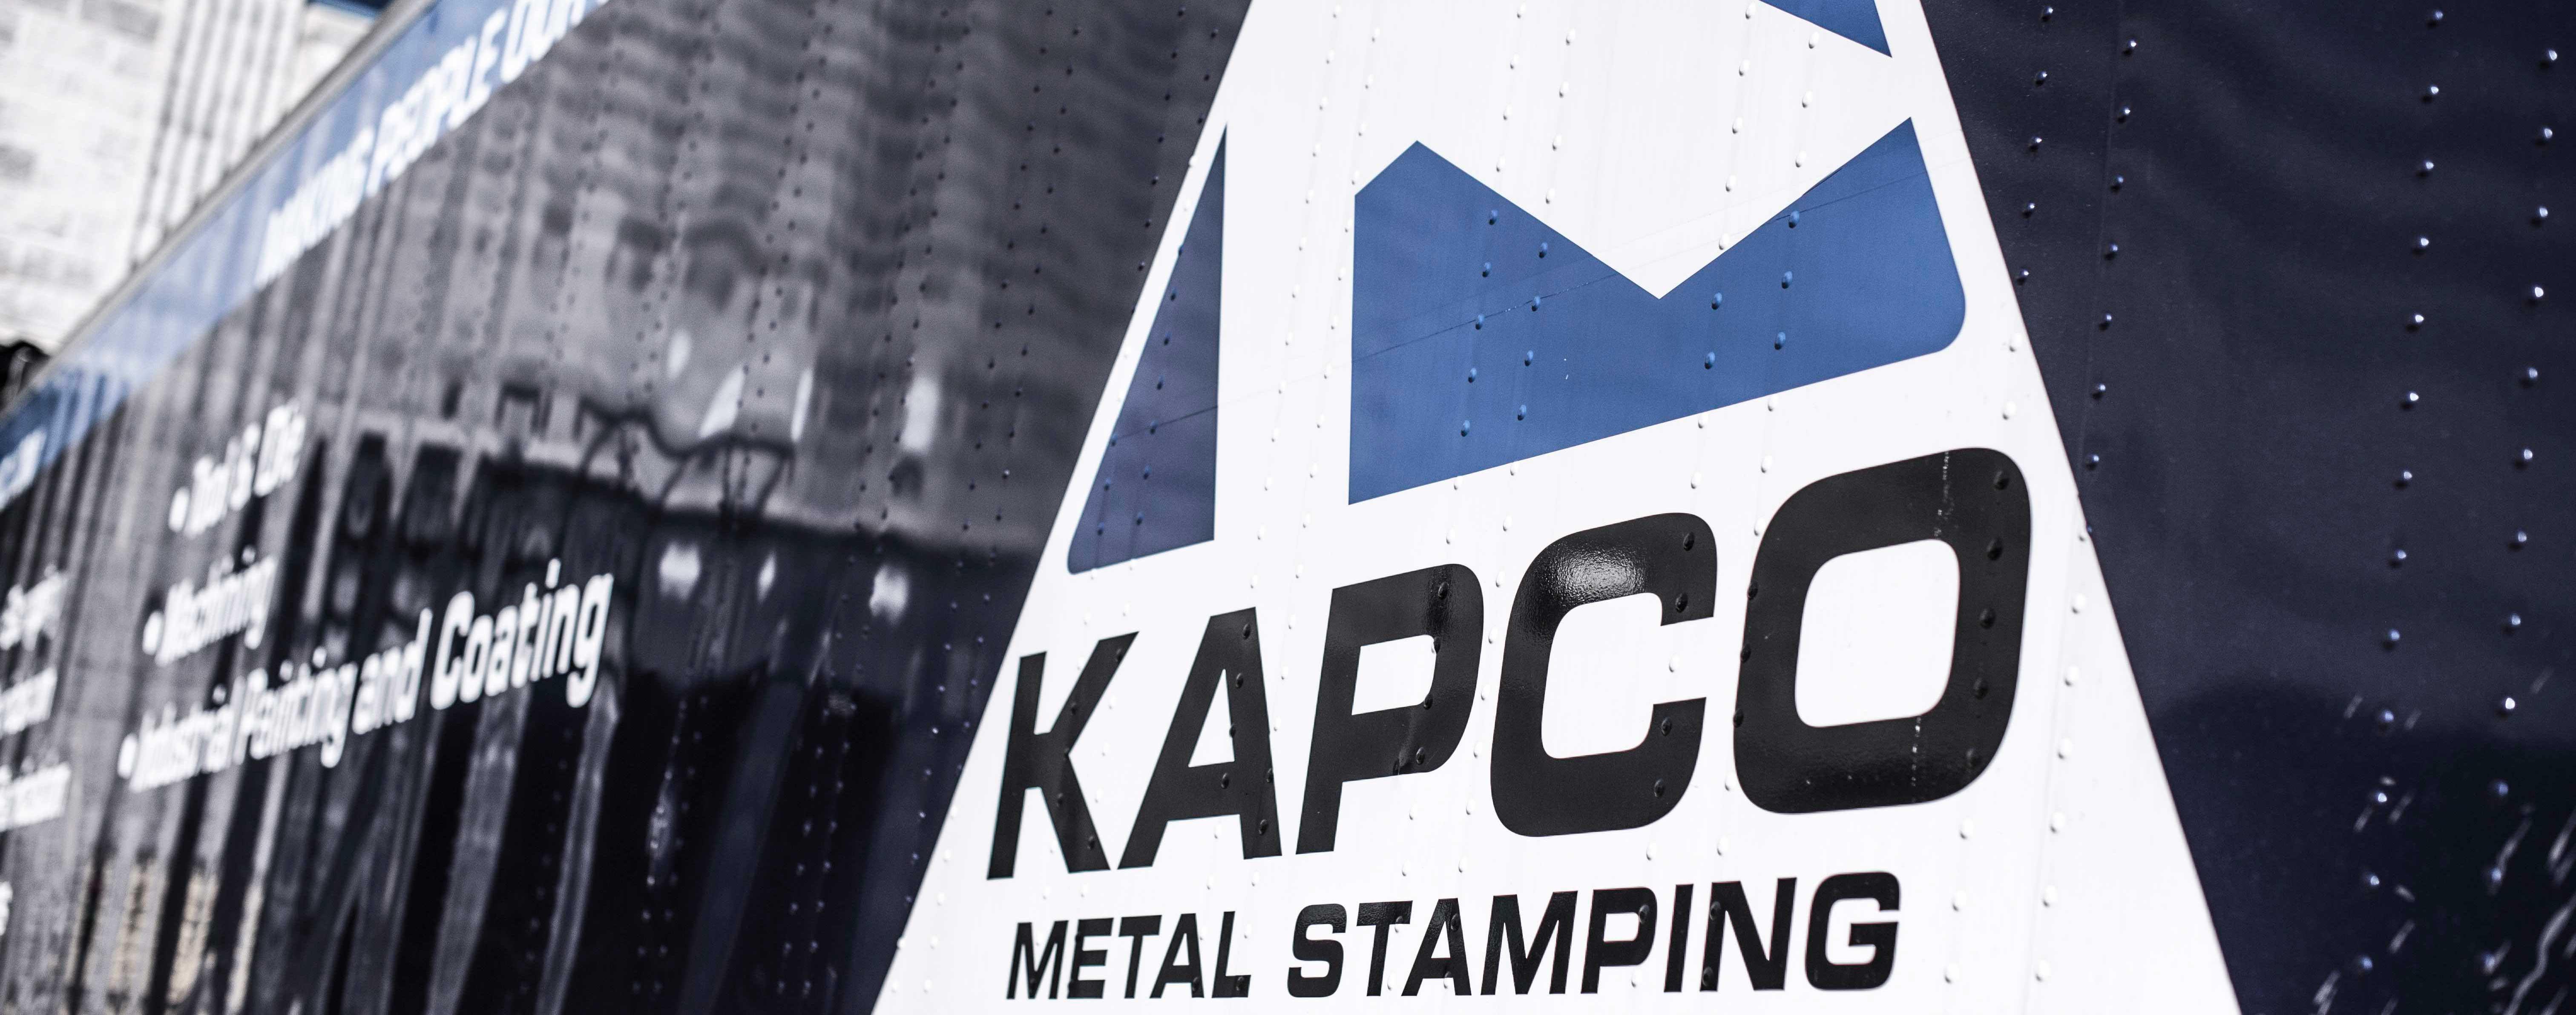 Kapco_Truck_Small_Wide2.jpg